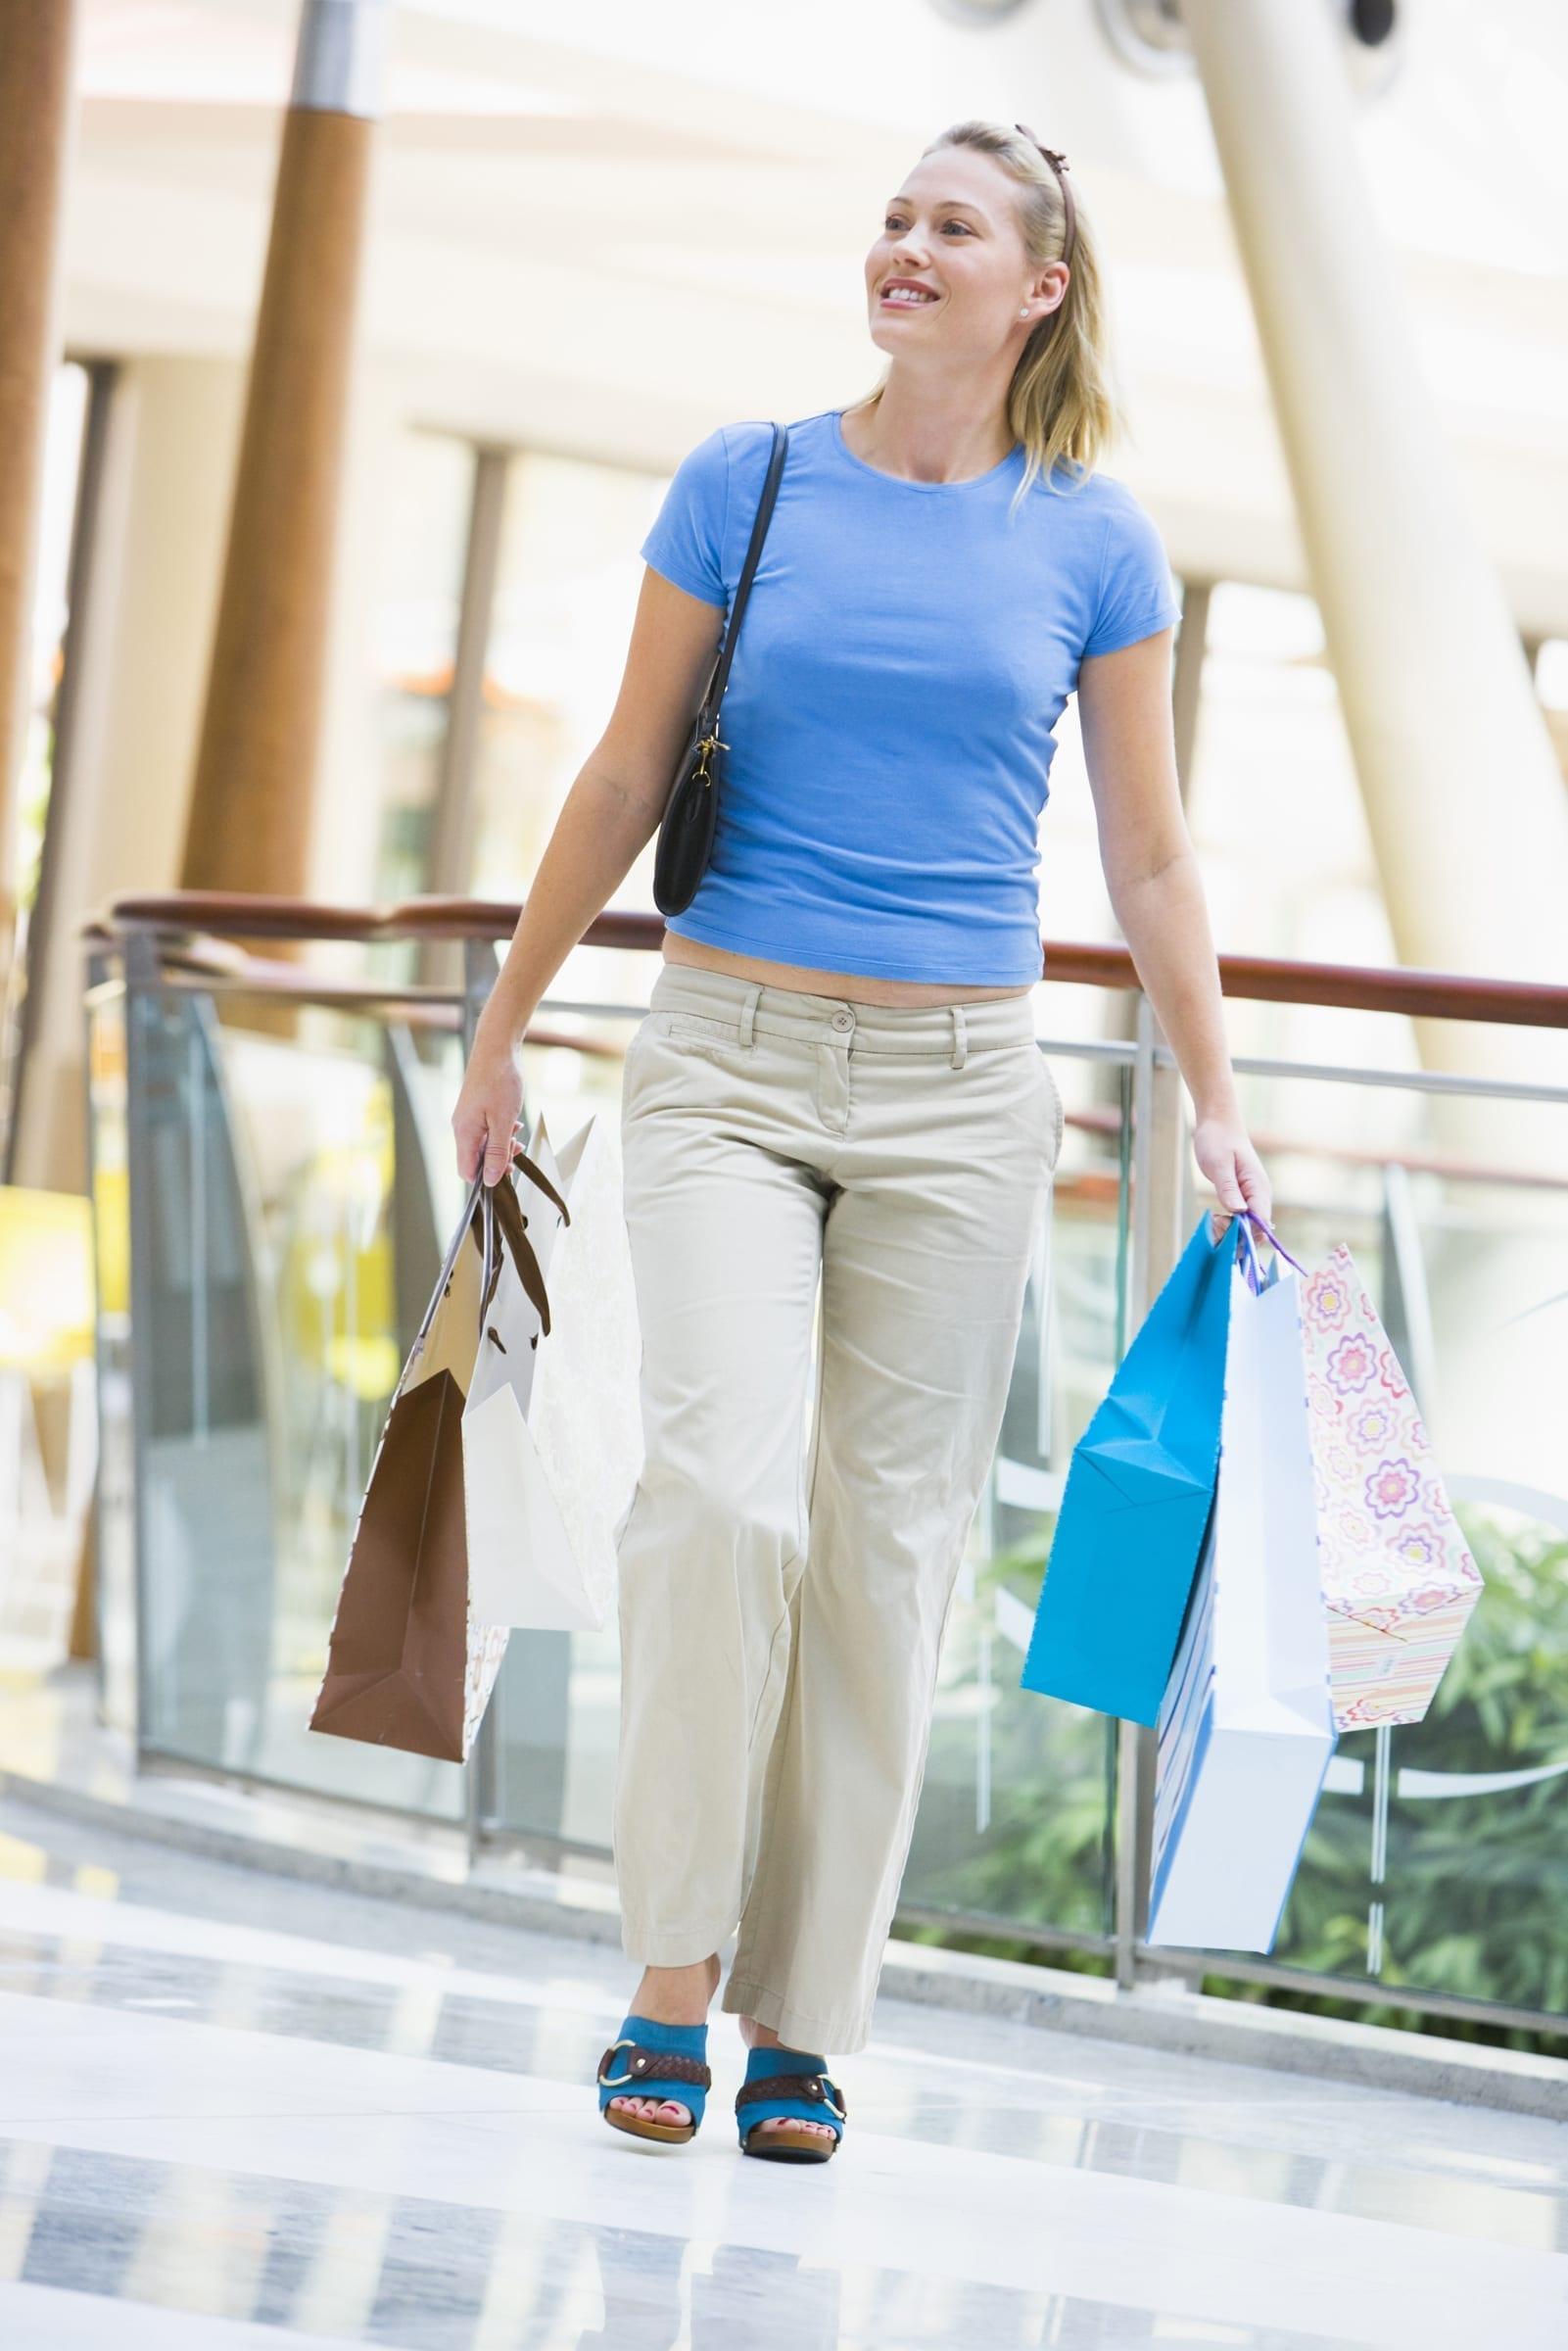 Consumidores e jornadas